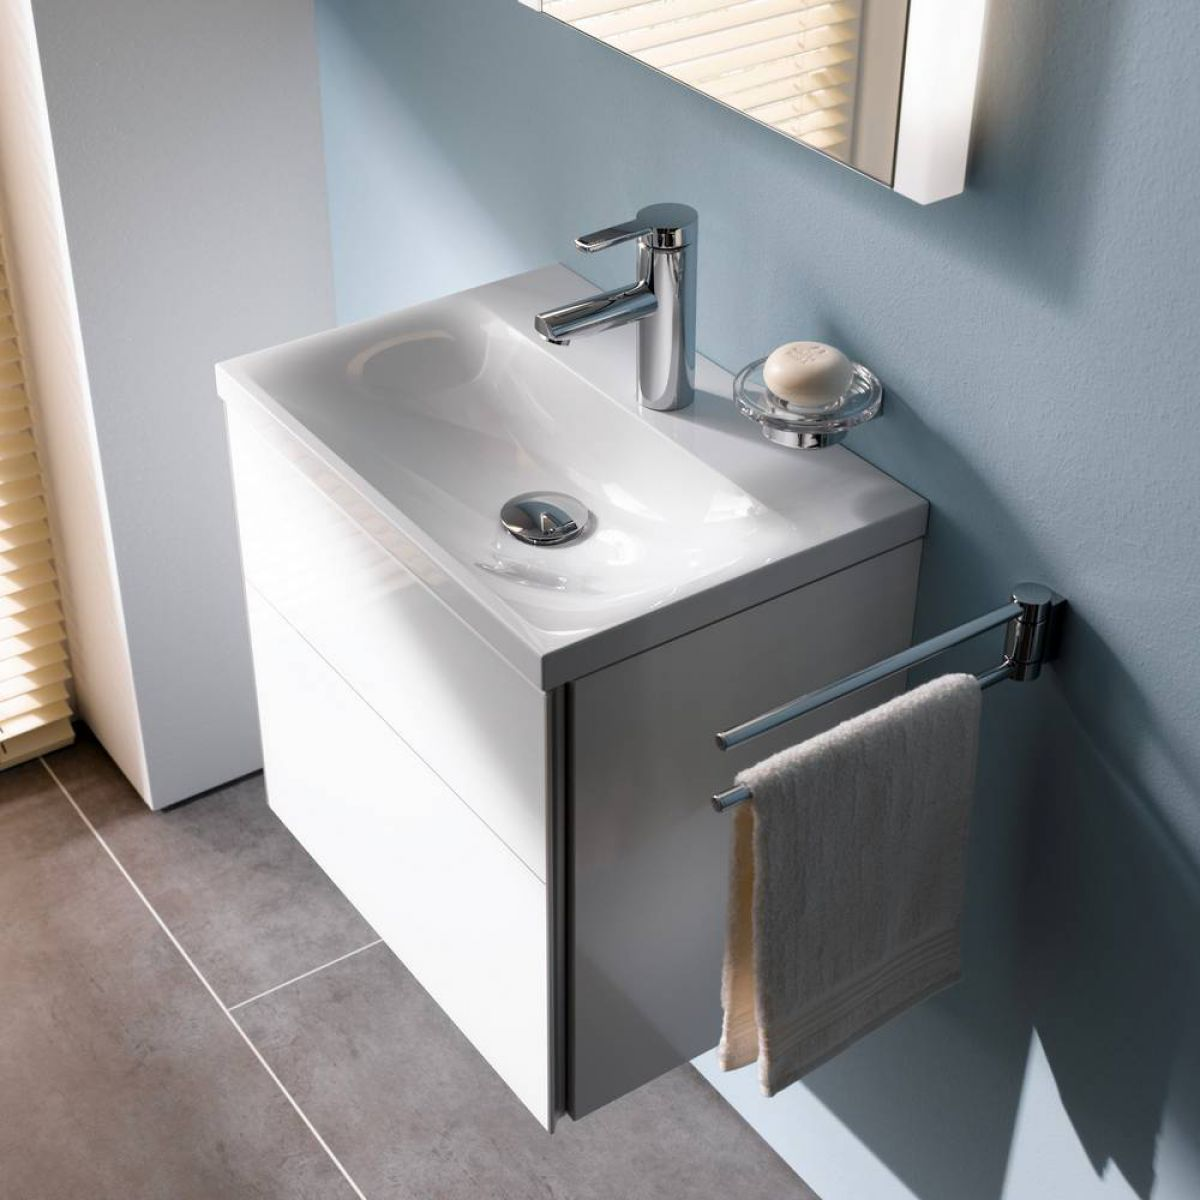 KEUCO ROYAL REFLEX   Fittings Accessories Mirror Cabinets Bathroom  Furniture And Washbasins